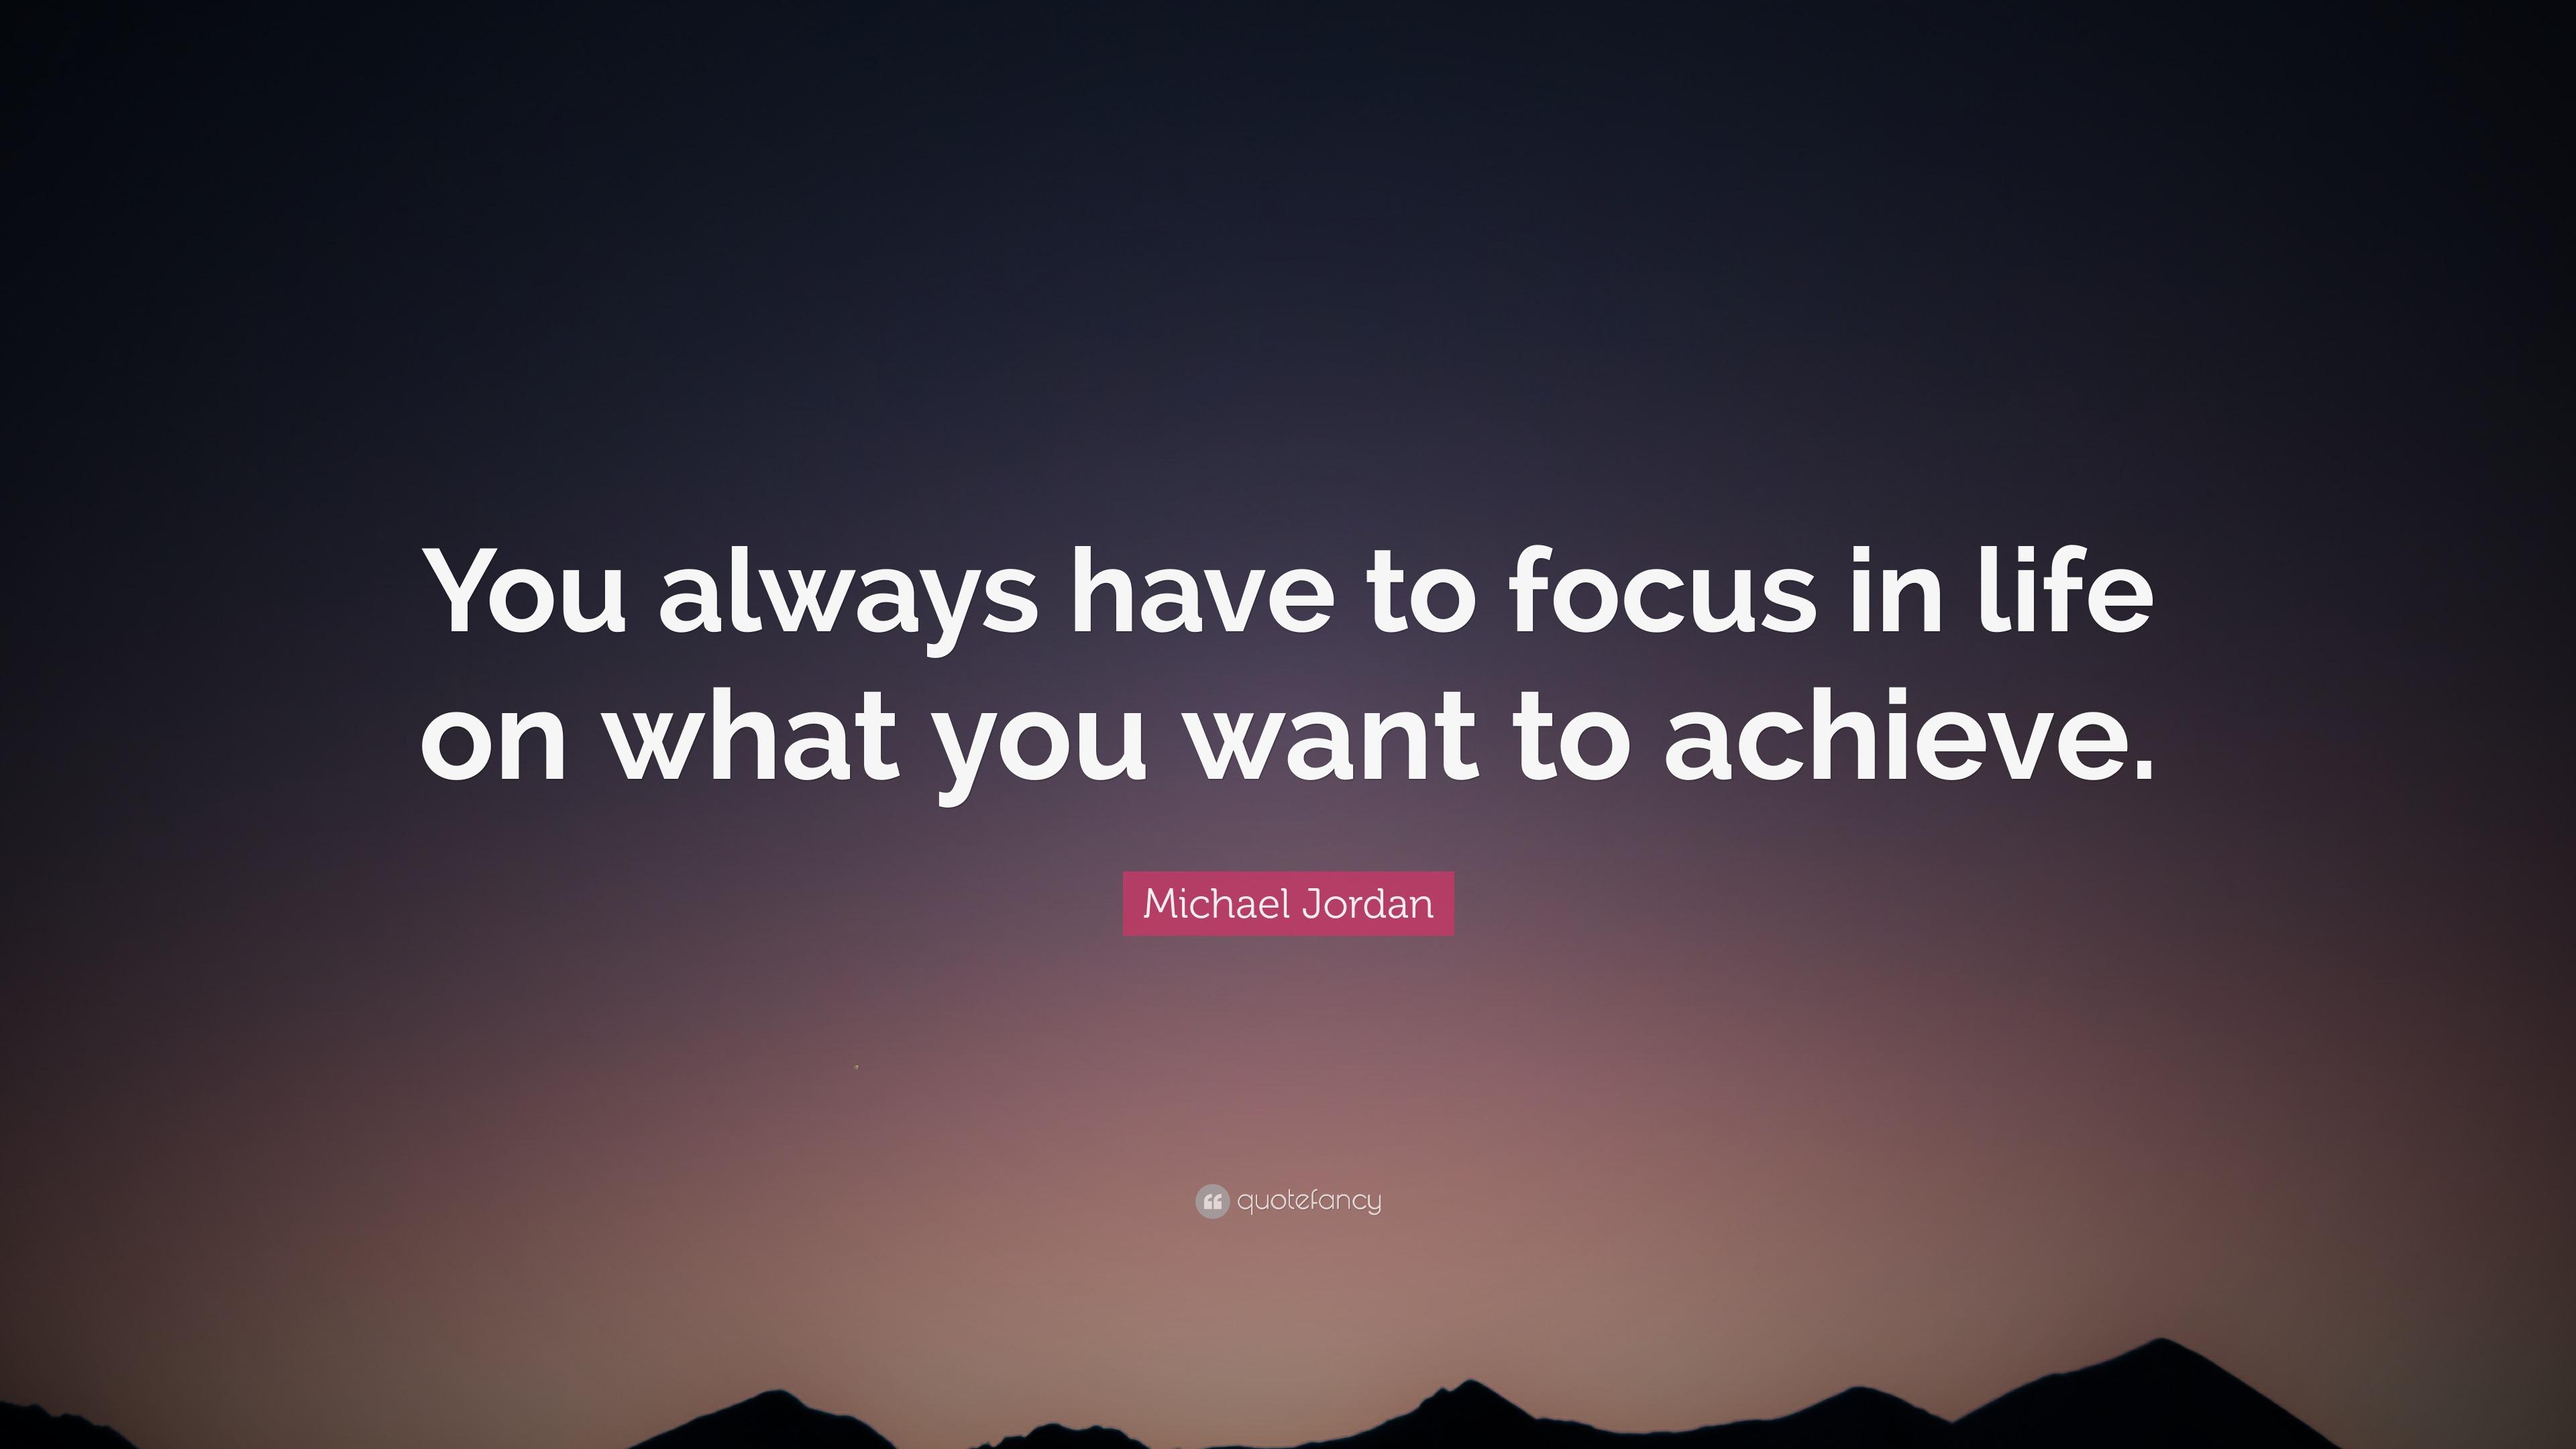 Focus Quotes (51 wallpapers) - Quotefancy